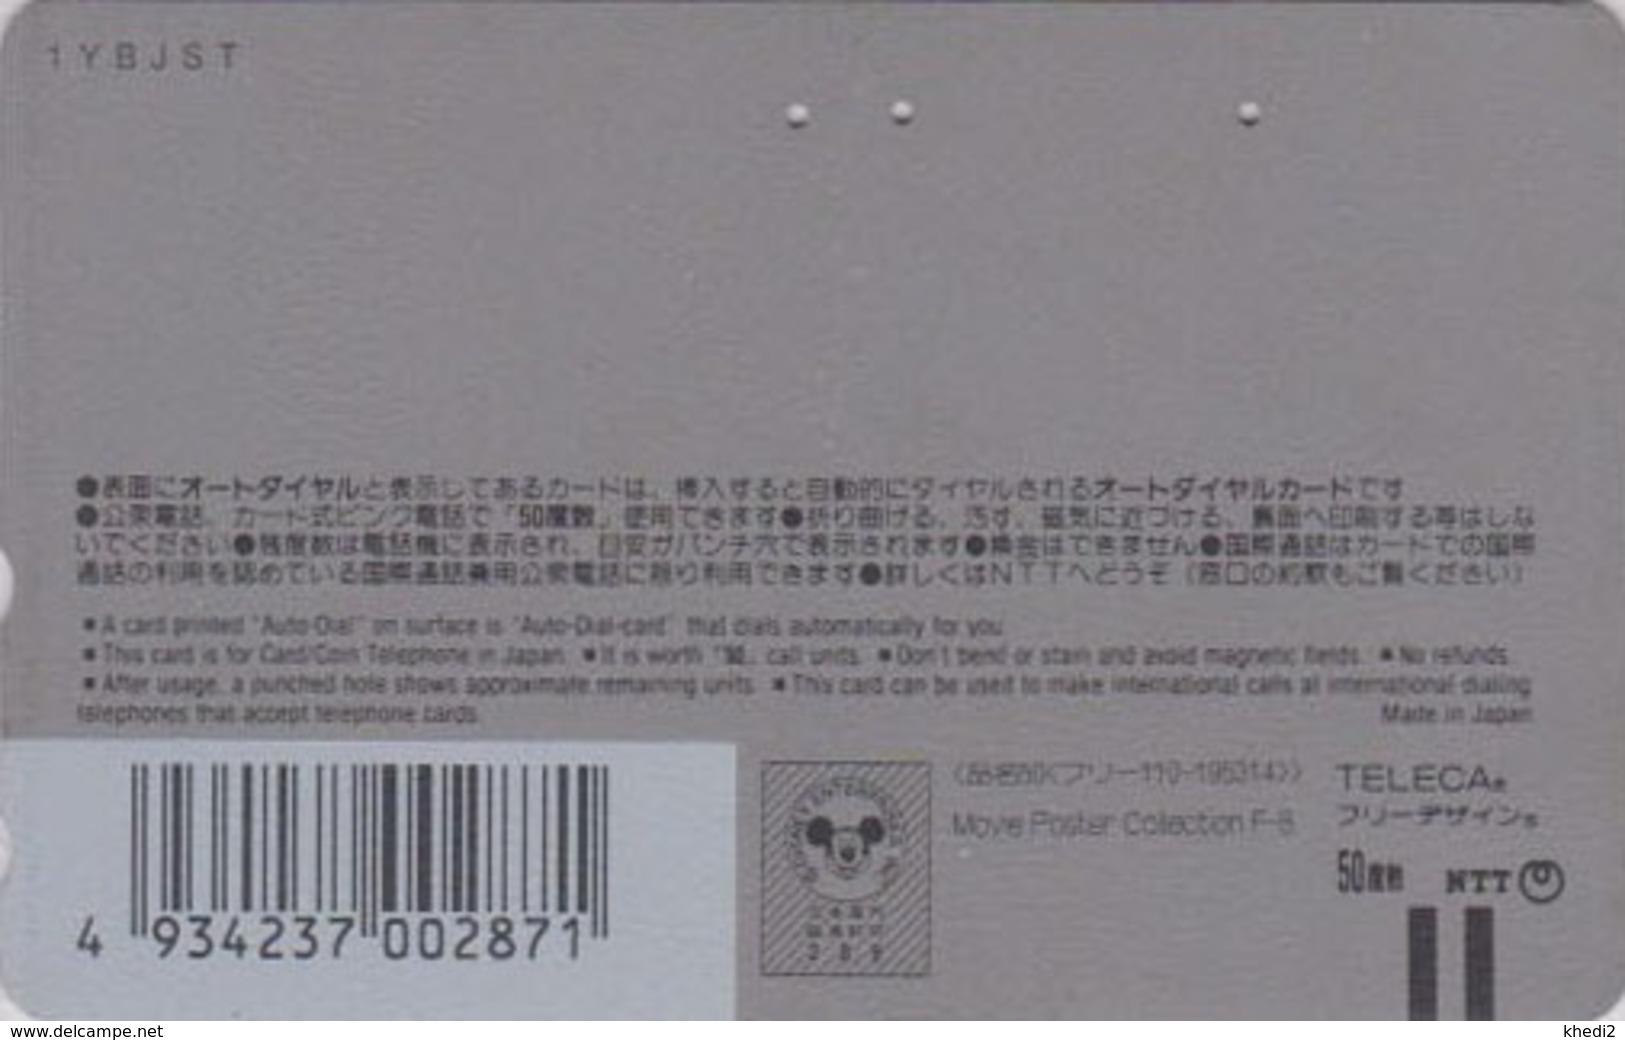 TC Japon  / 110-195314 - DISNEY - Série MOVIE POSTER COLLECTION F8 - MICKEY ** FANTASIA ** - Japan Phonecard - Disney